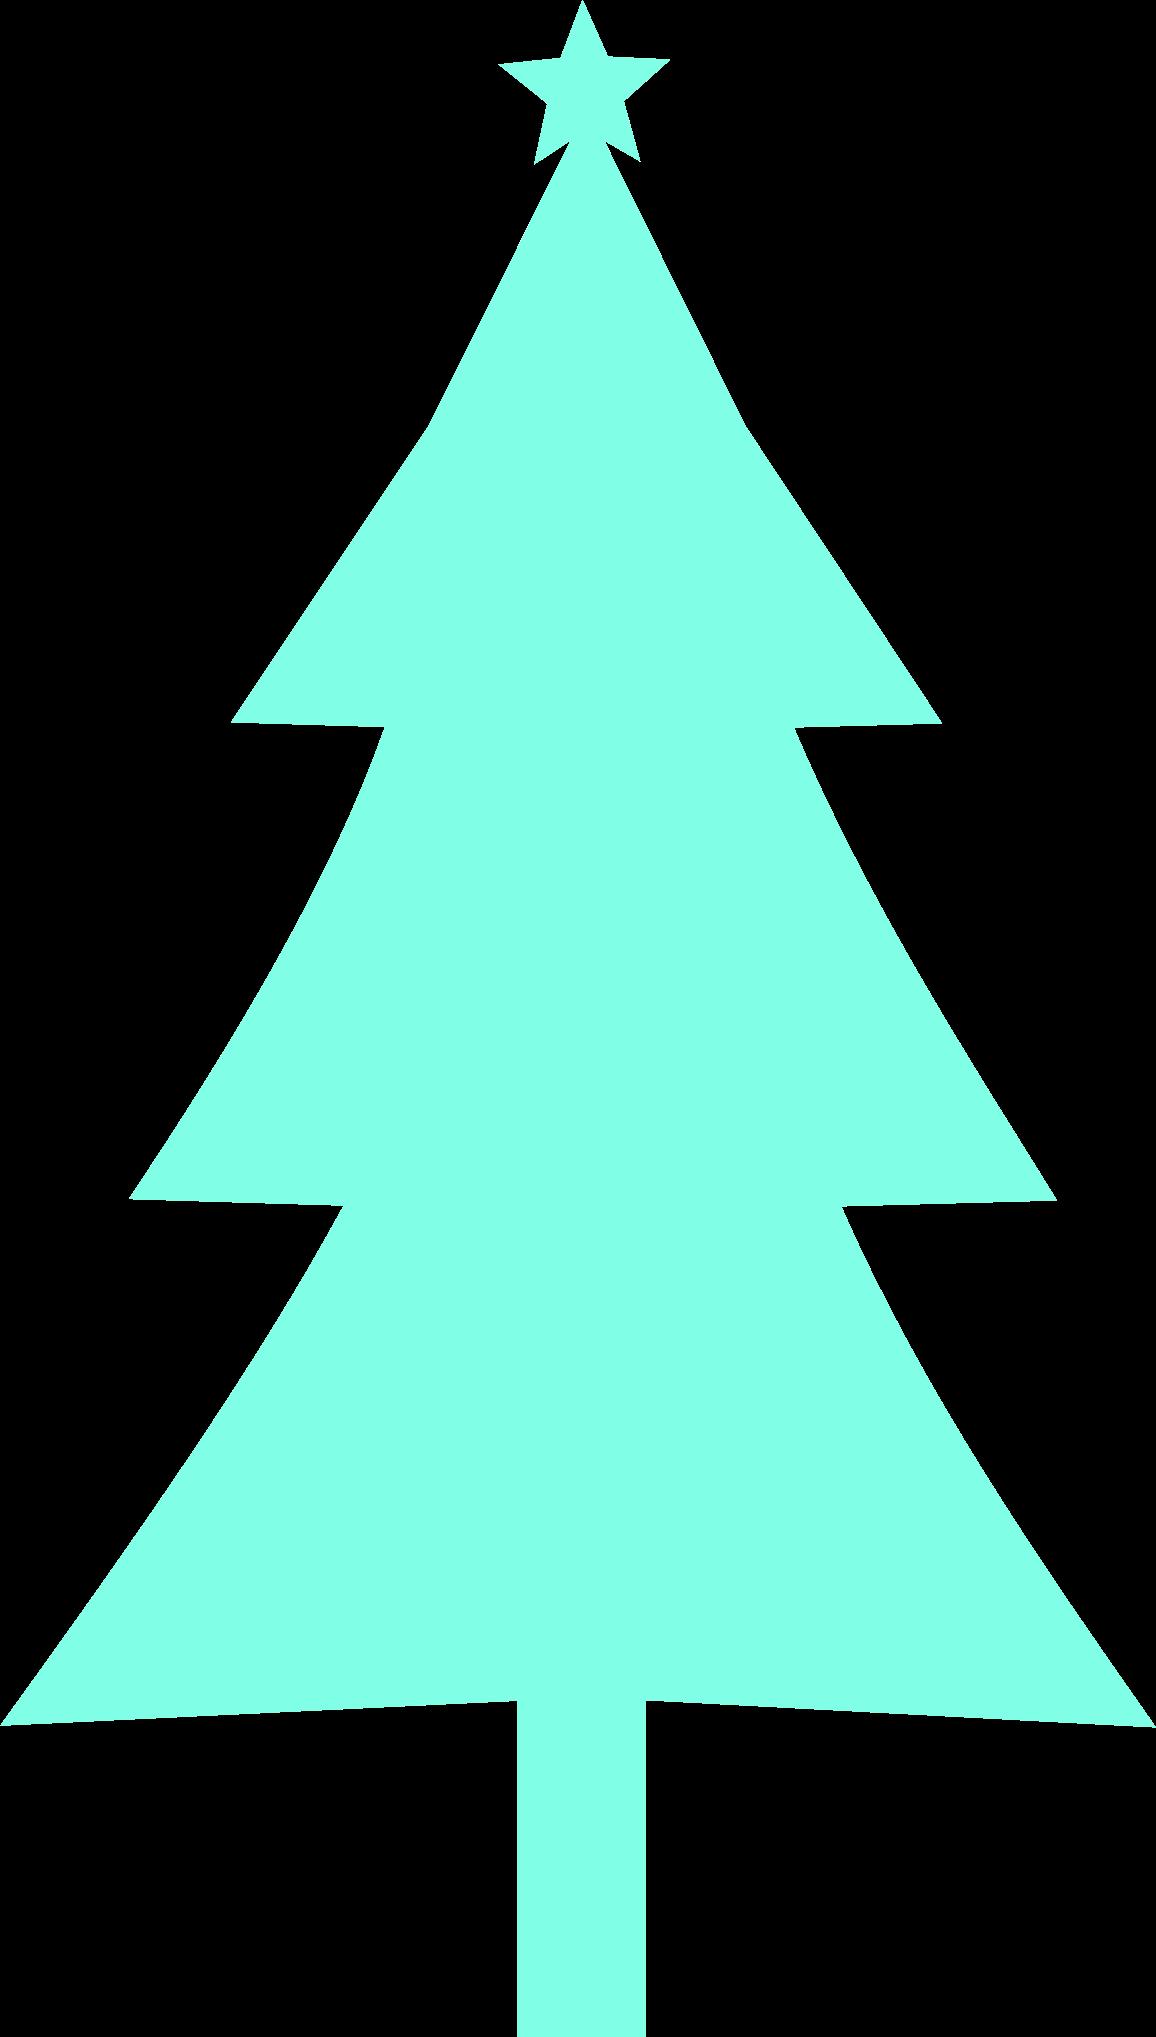 Christmas tree clipart silhouette clip art black and white Clipart - Christmas tree Silhouette clip art black and white